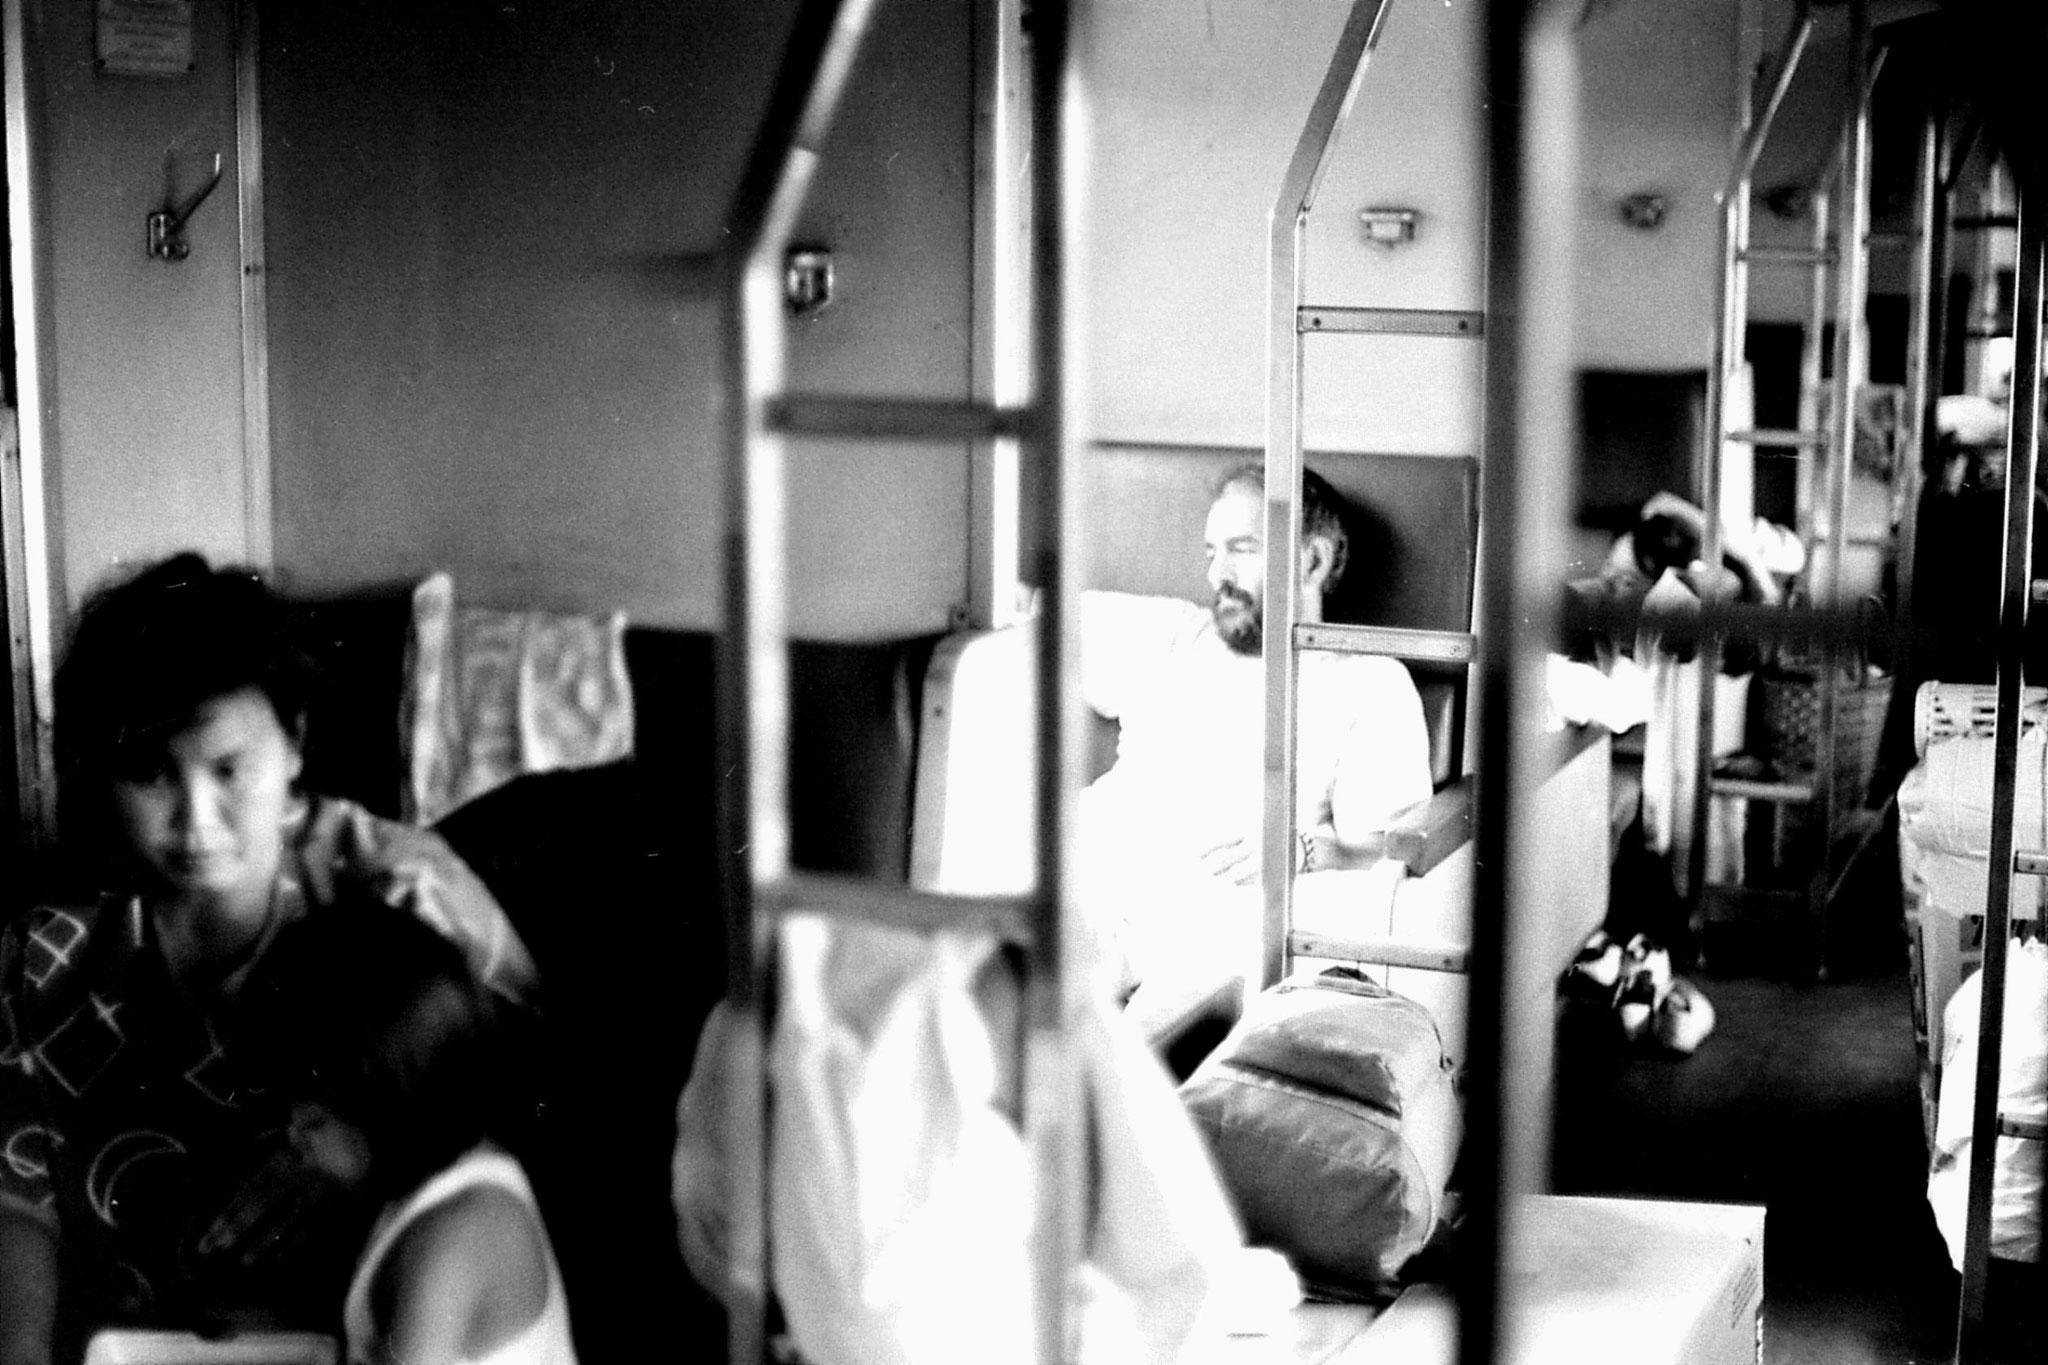 18/6/1990: 30: second class sleeper carriage